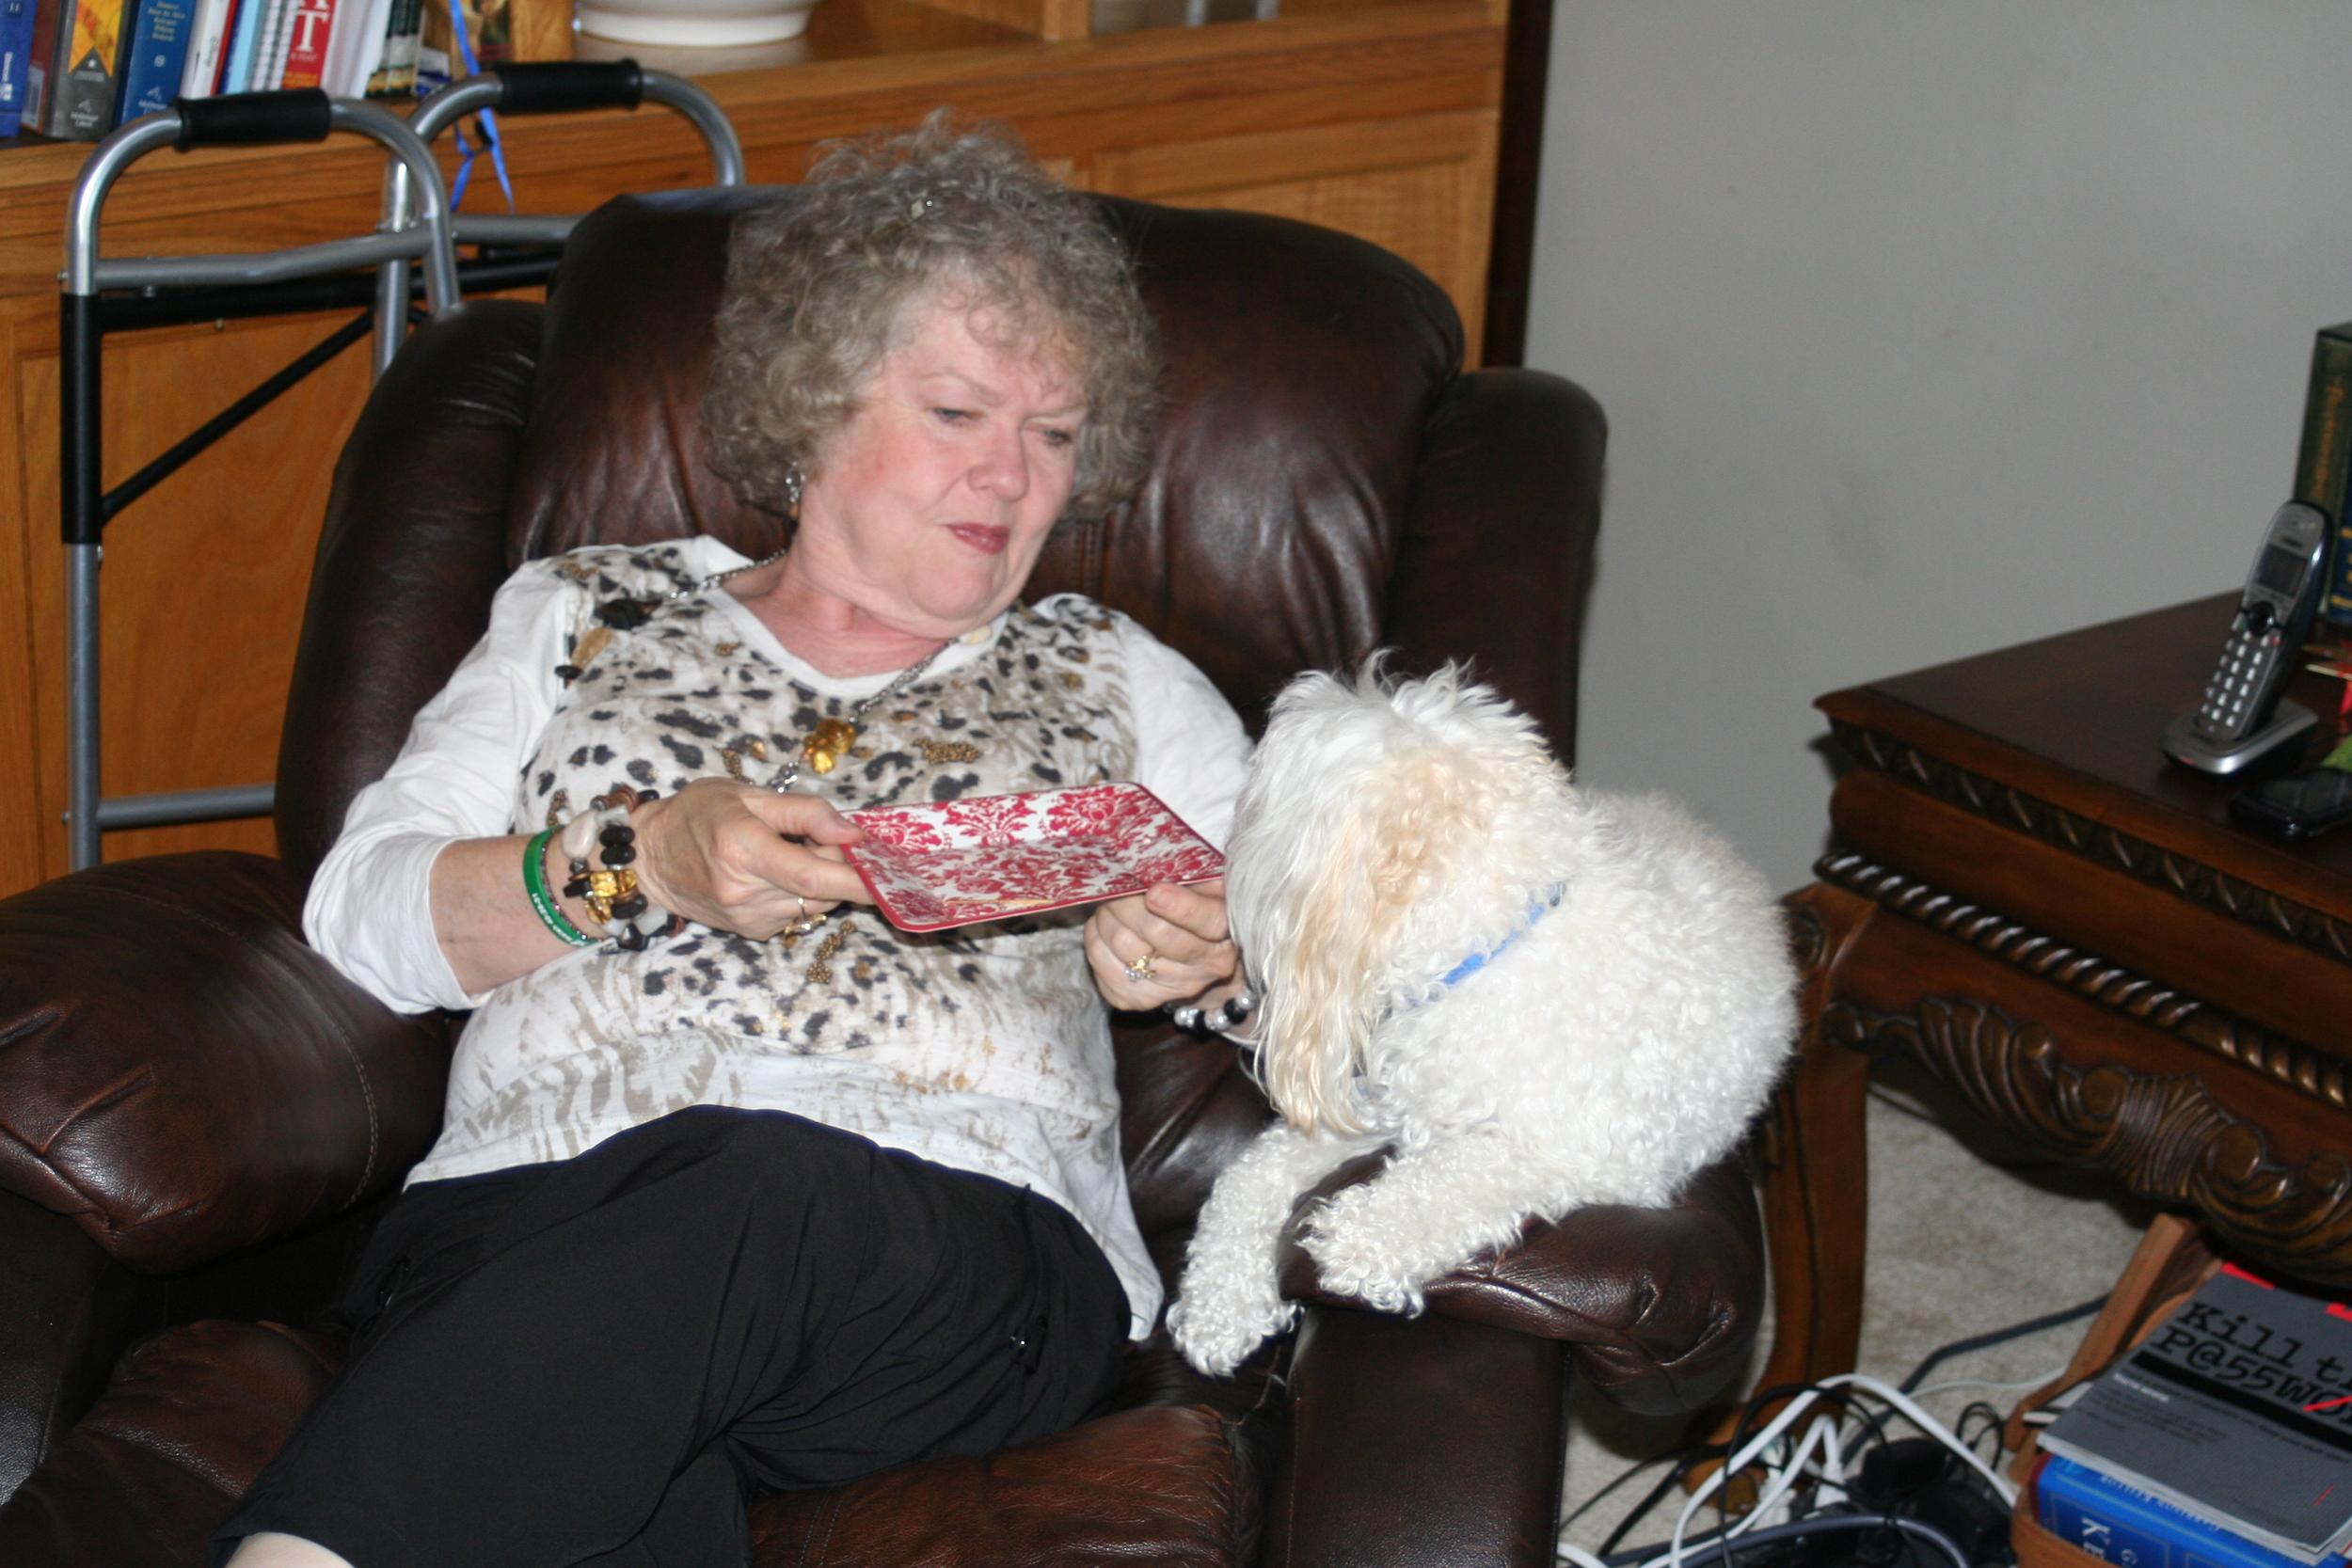 Dodger found Grandma Massongill's plate most interesting!